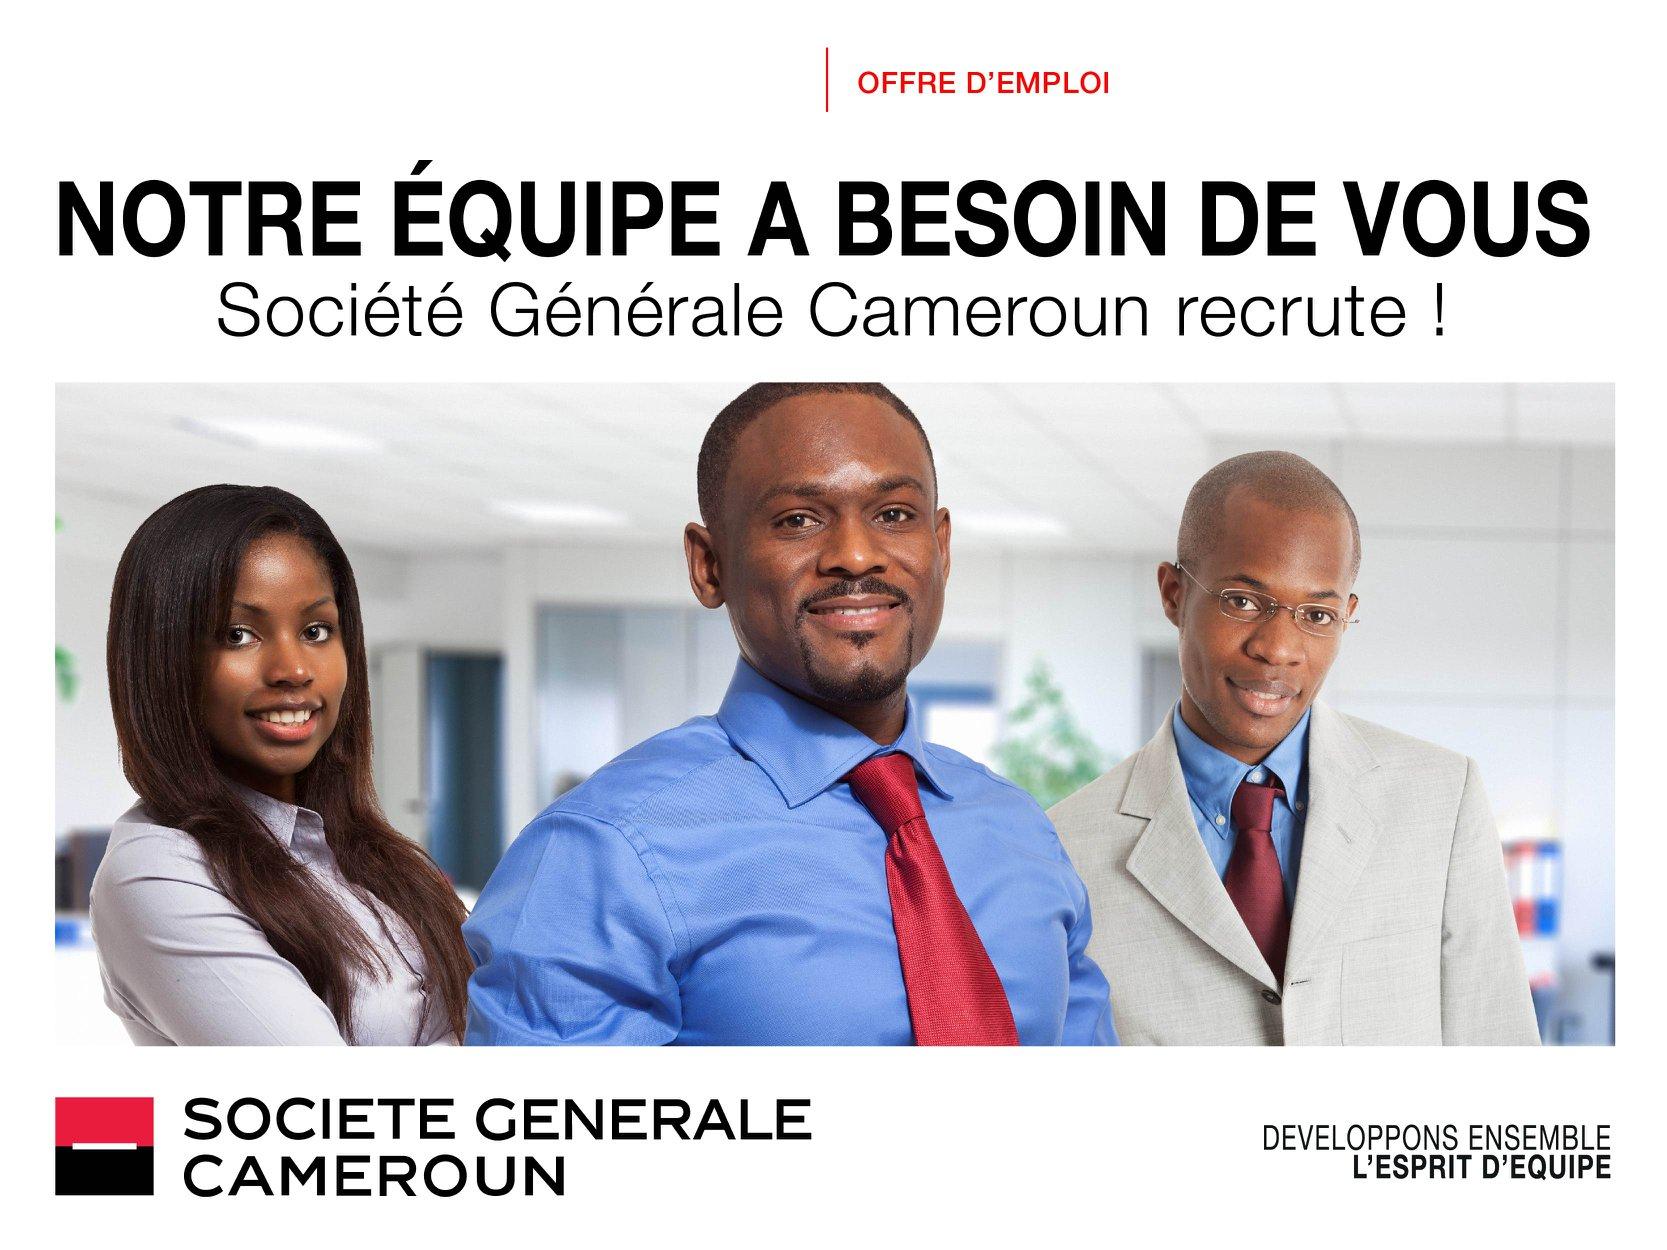 OFFRES D'EMPLOIS SGC CAMEROUN